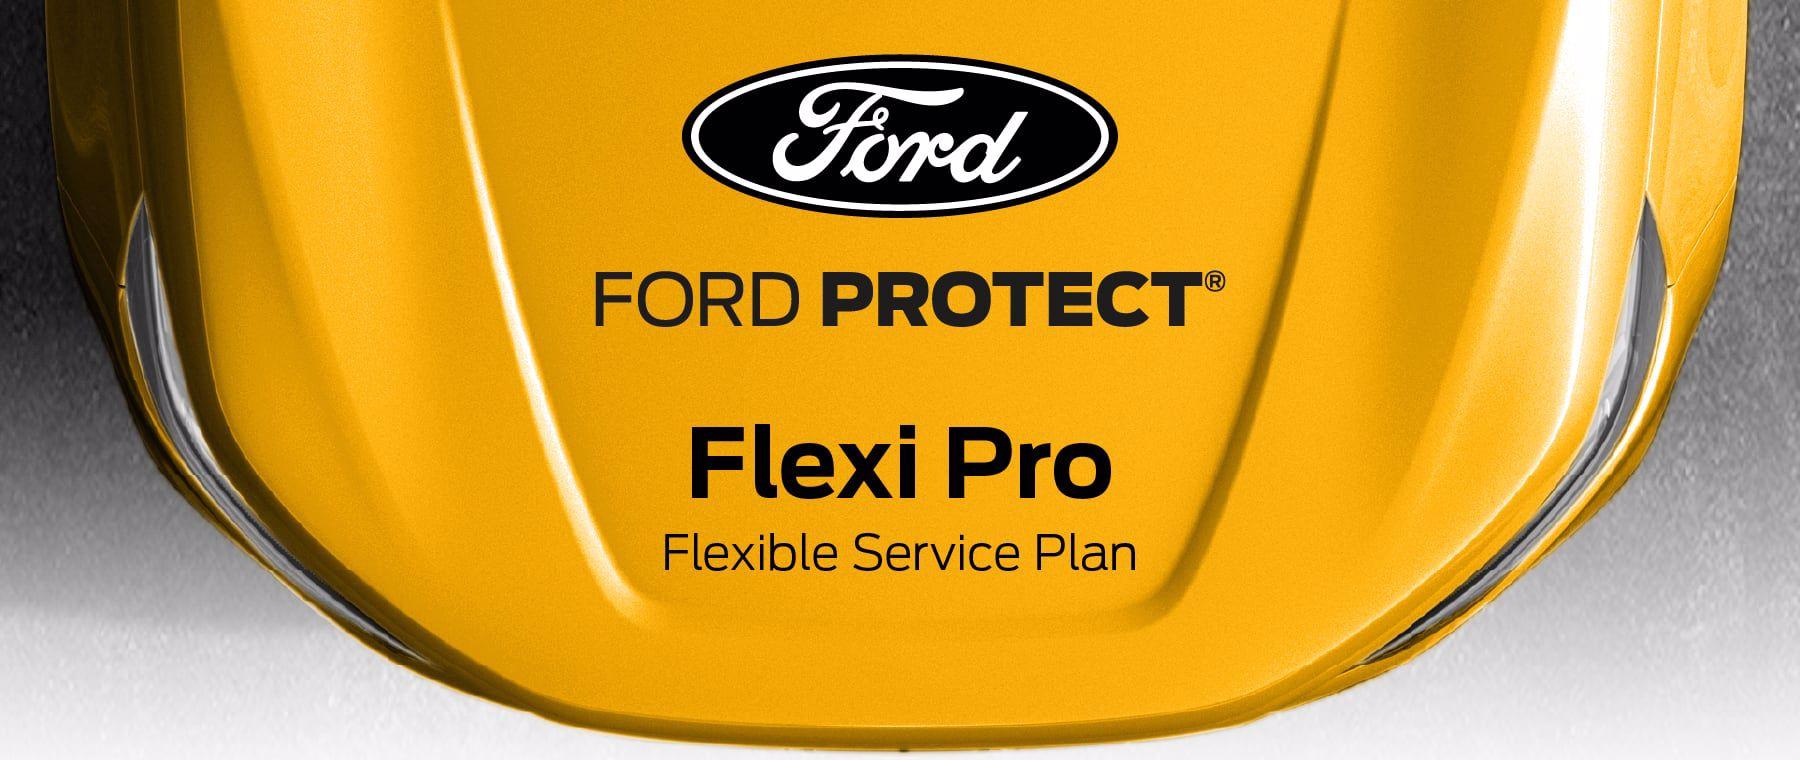 [Flexi Pro]